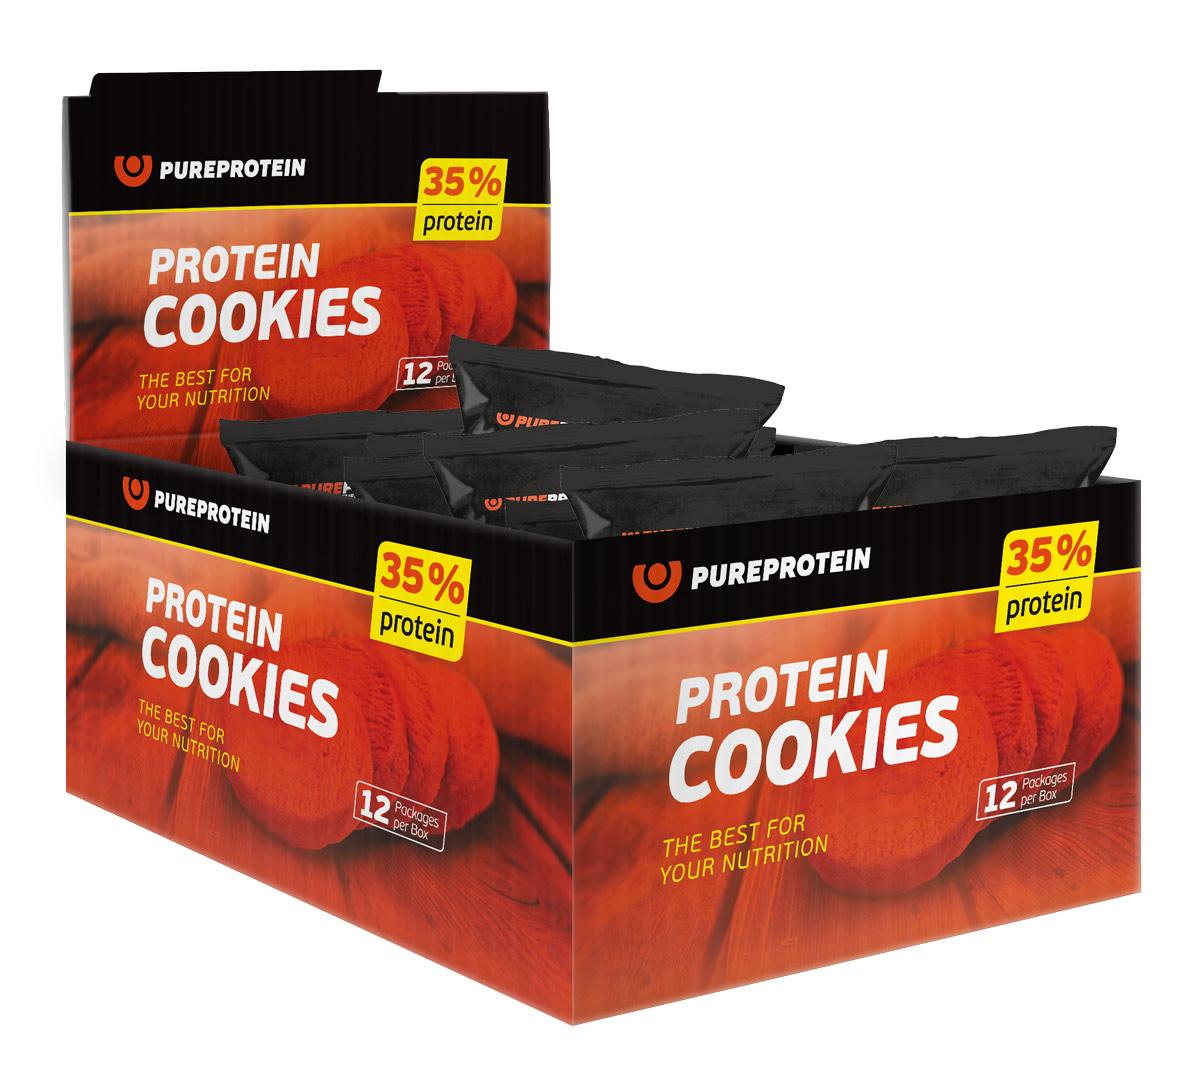 Печенье PureProtein Protein Cookies, с высоким содержанием белка, кокос, 12 шт по 80 г печенье fuze cookies кокос 40 г